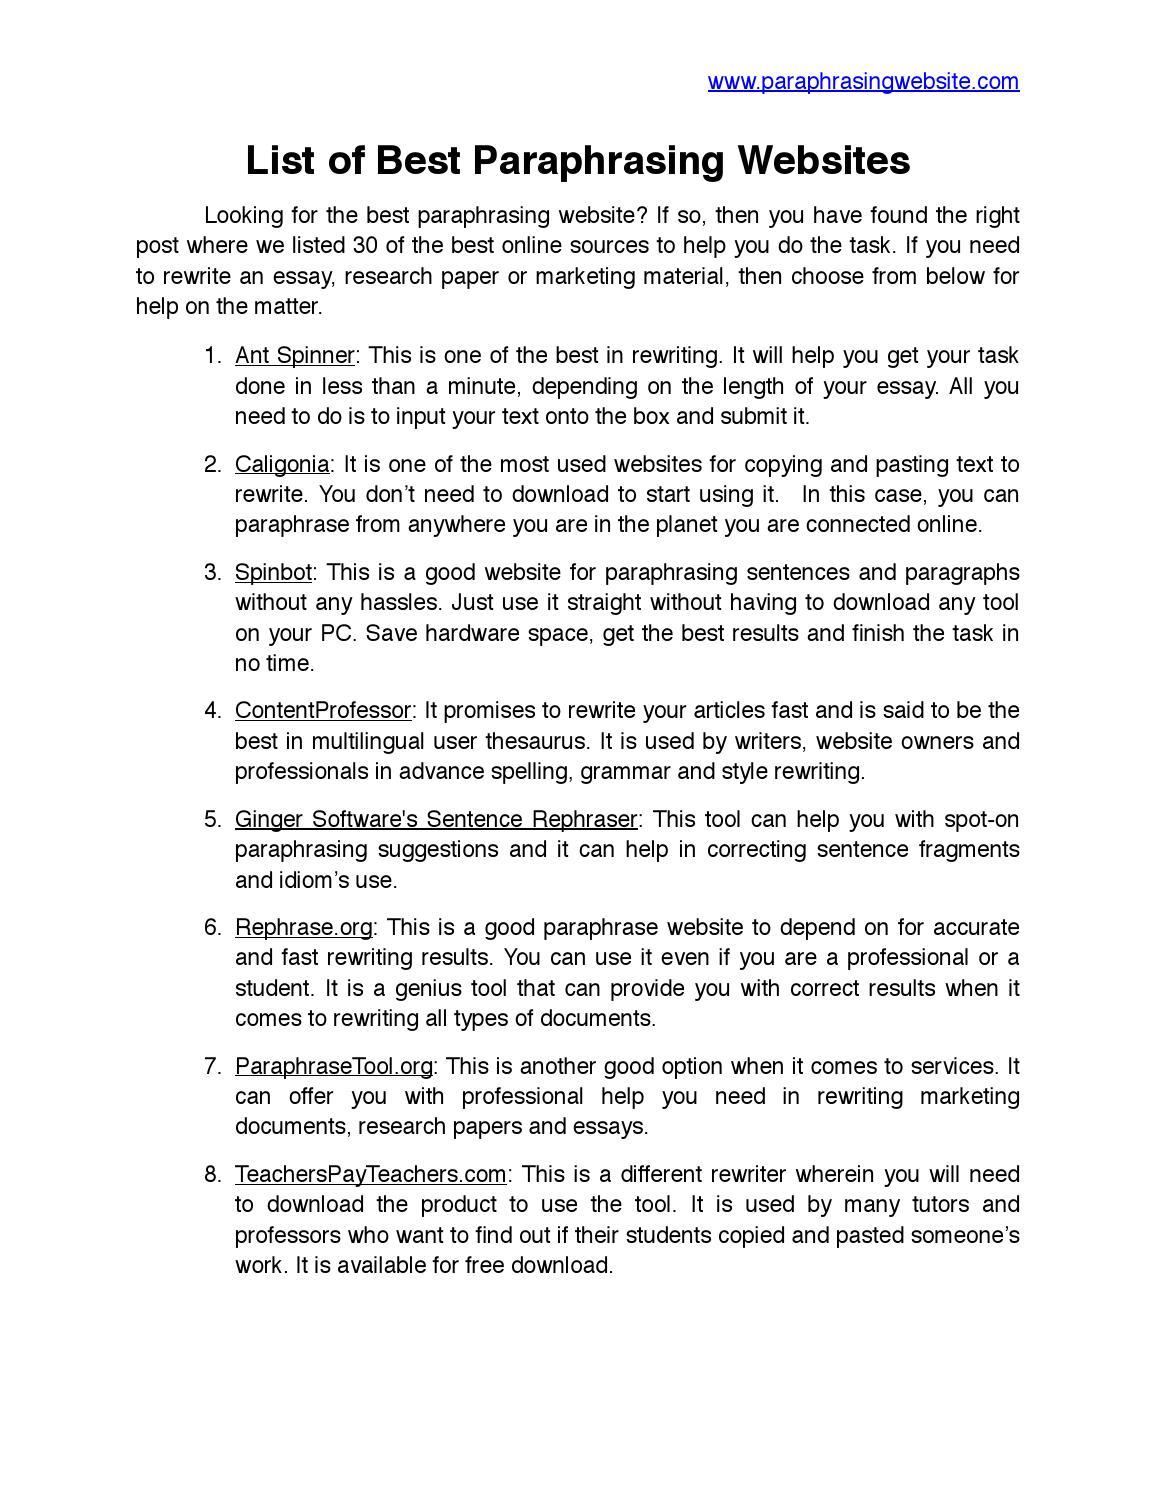 Rewrite essay free ten steps to write an essay